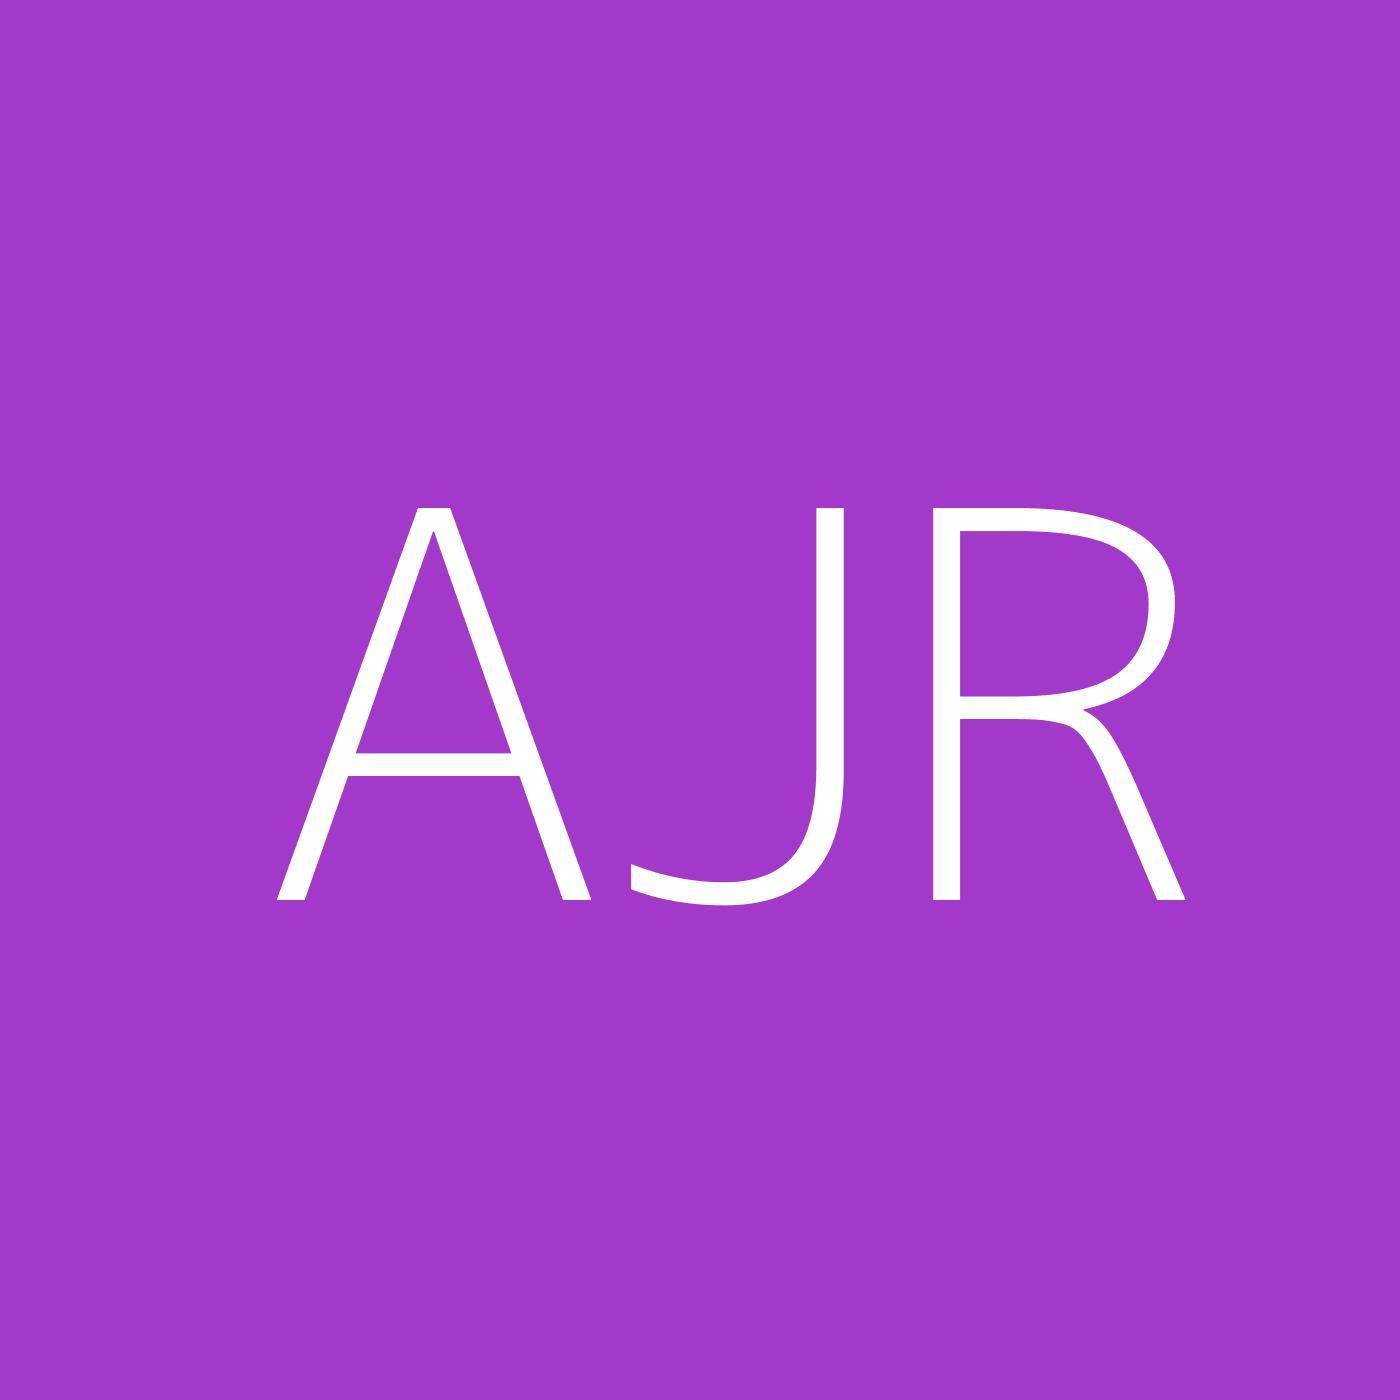 AJR Playlist Artwork